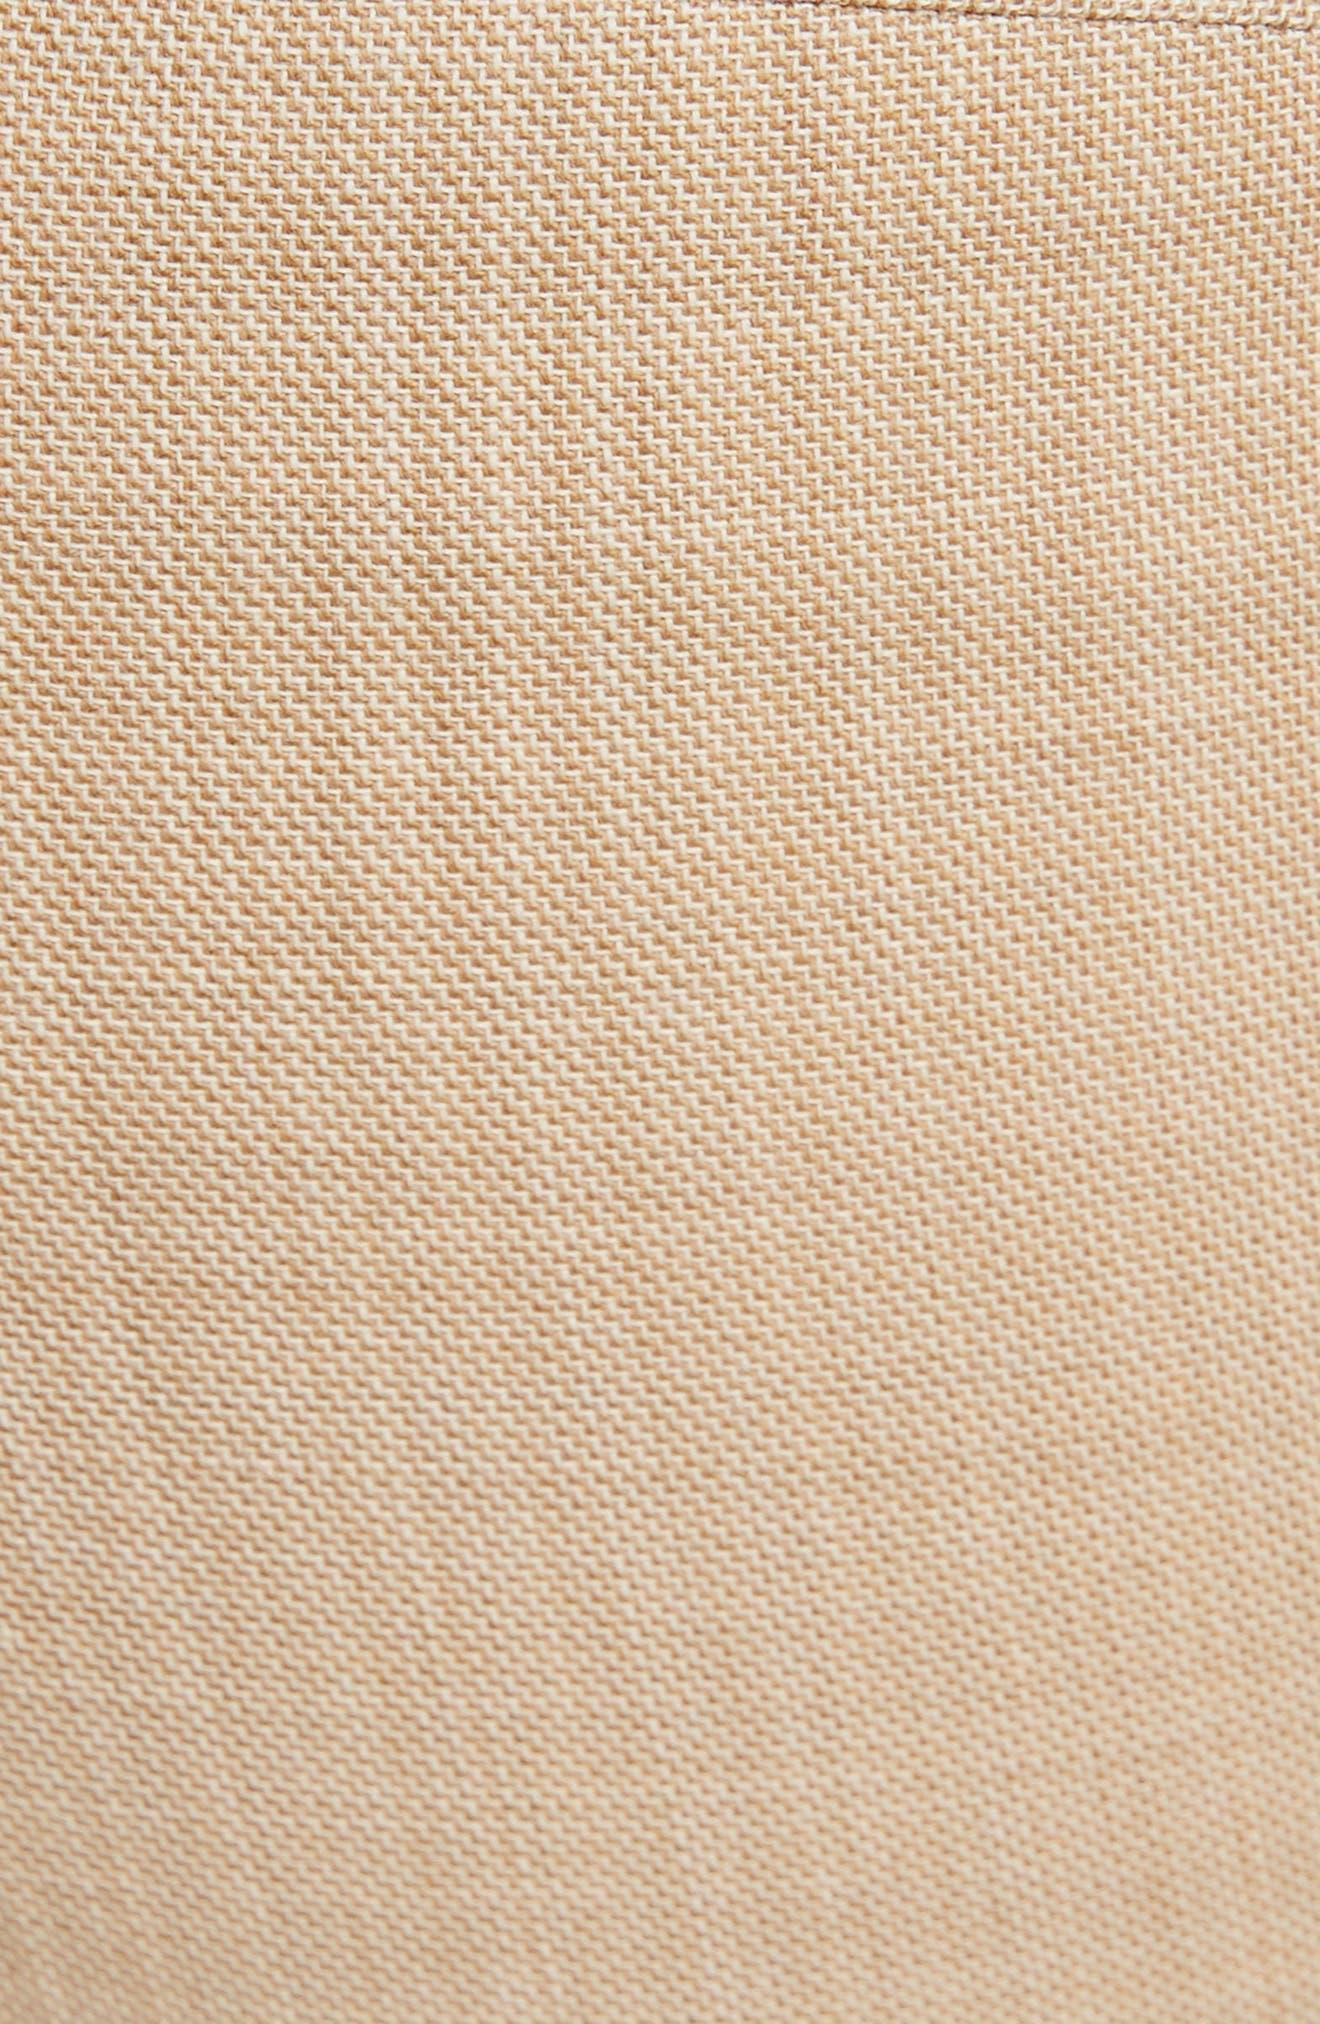 High Waist Flare Wool Pants,                             Alternate thumbnail 5, color,                             LIGHT BEIGE-WHITE